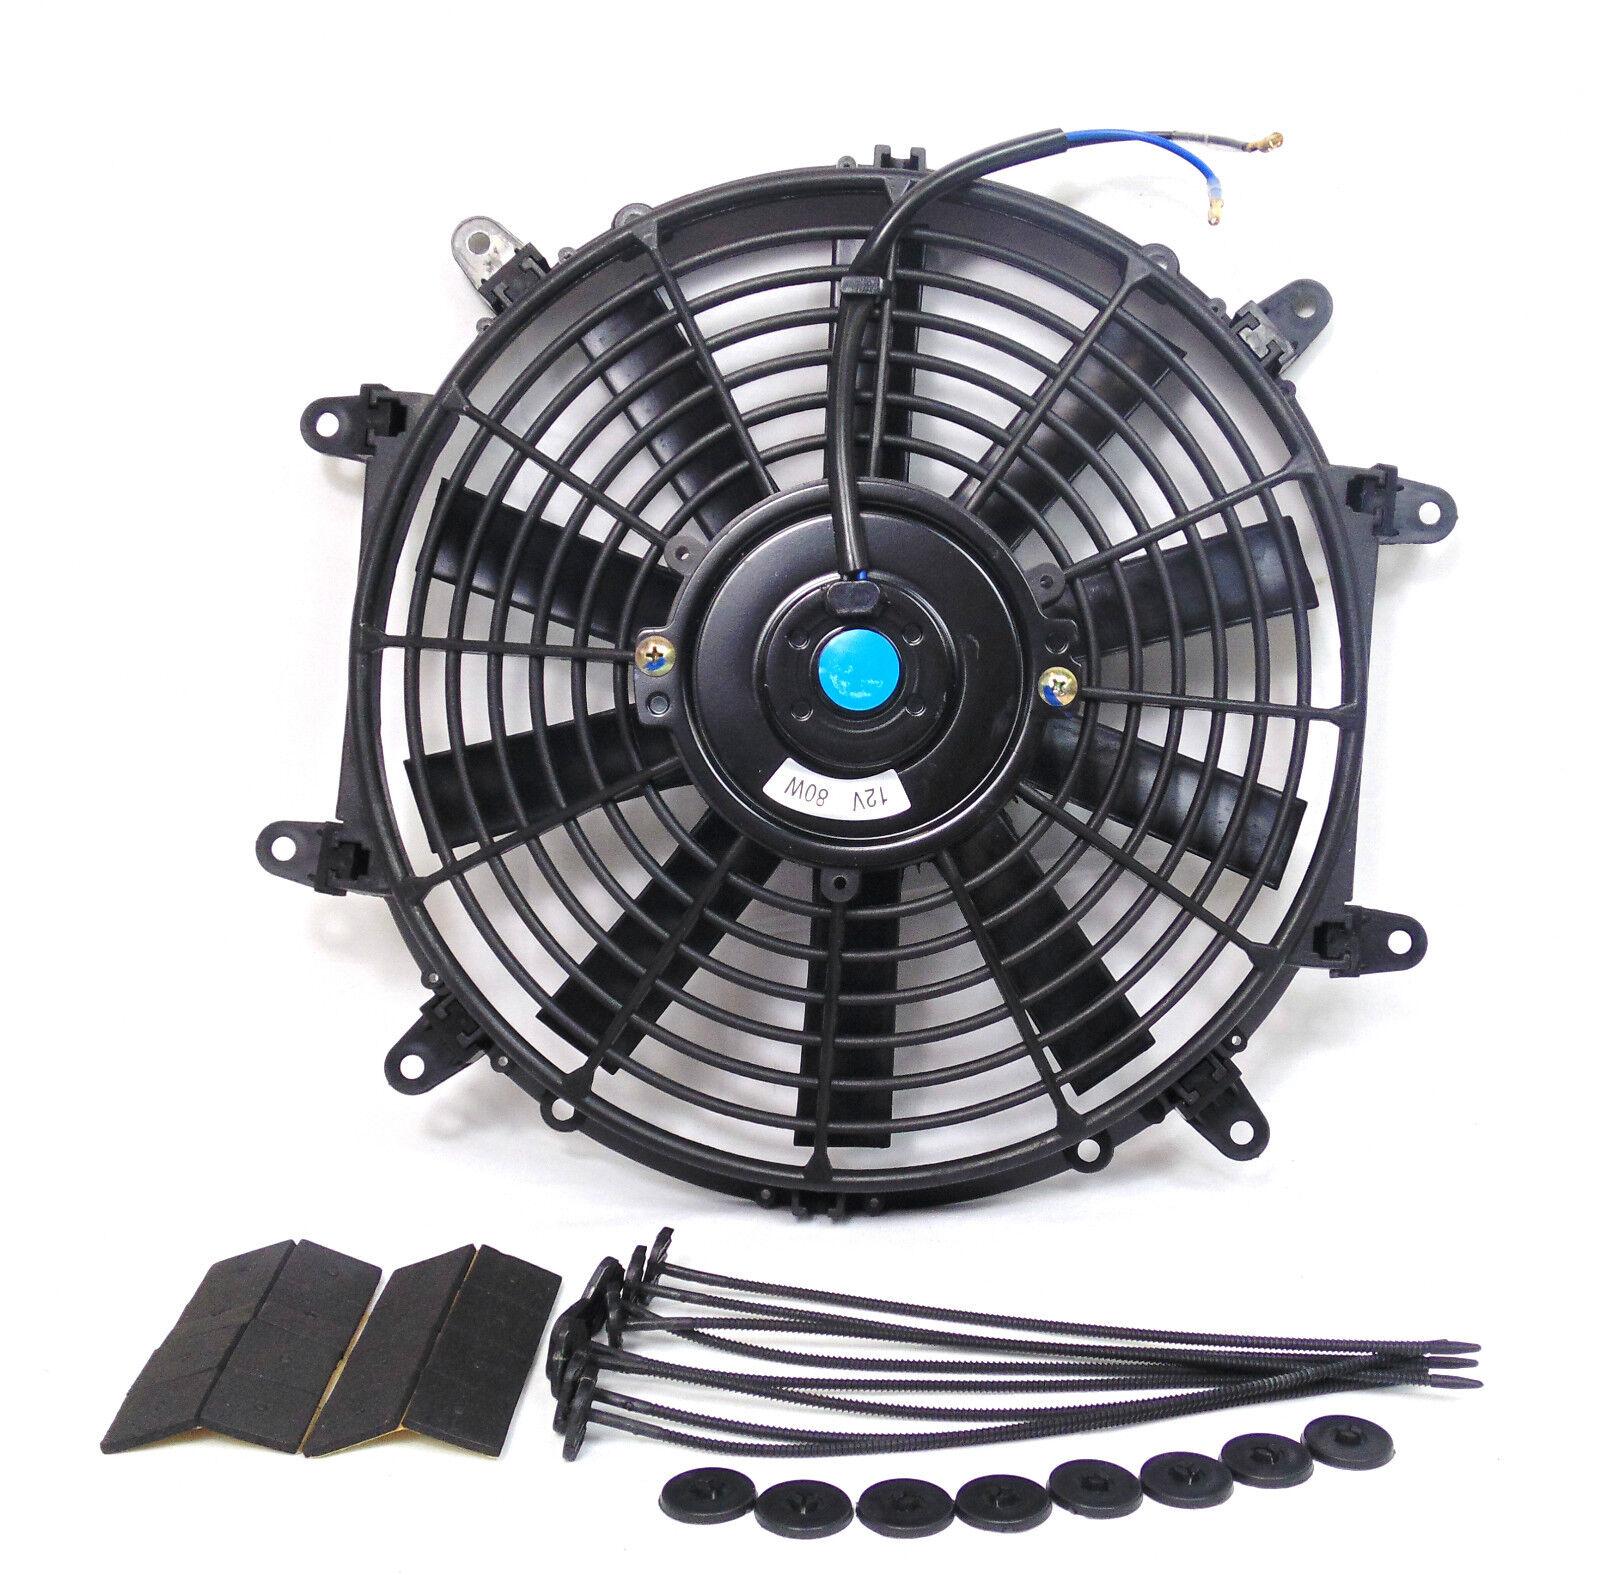 Premium 12 Inch Slim Universal Electric Radiator Cooling Fan 8 Home Electrics Category Listing Super